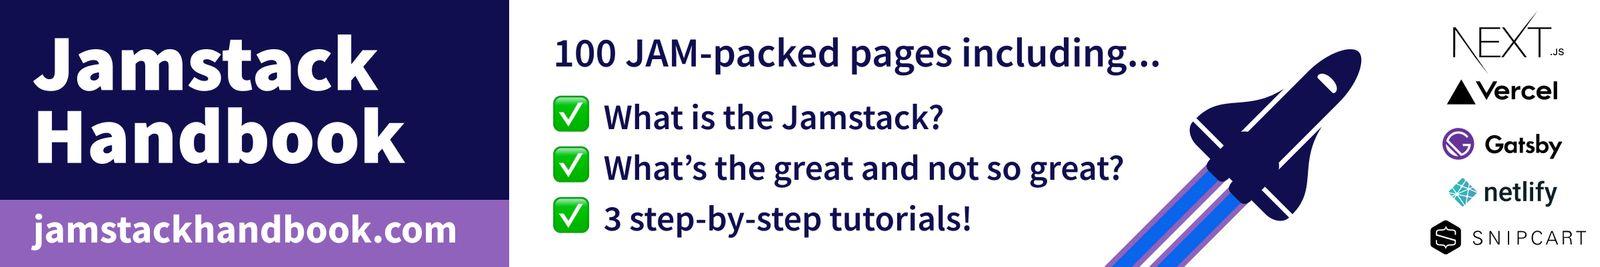 Jamstack Handbook